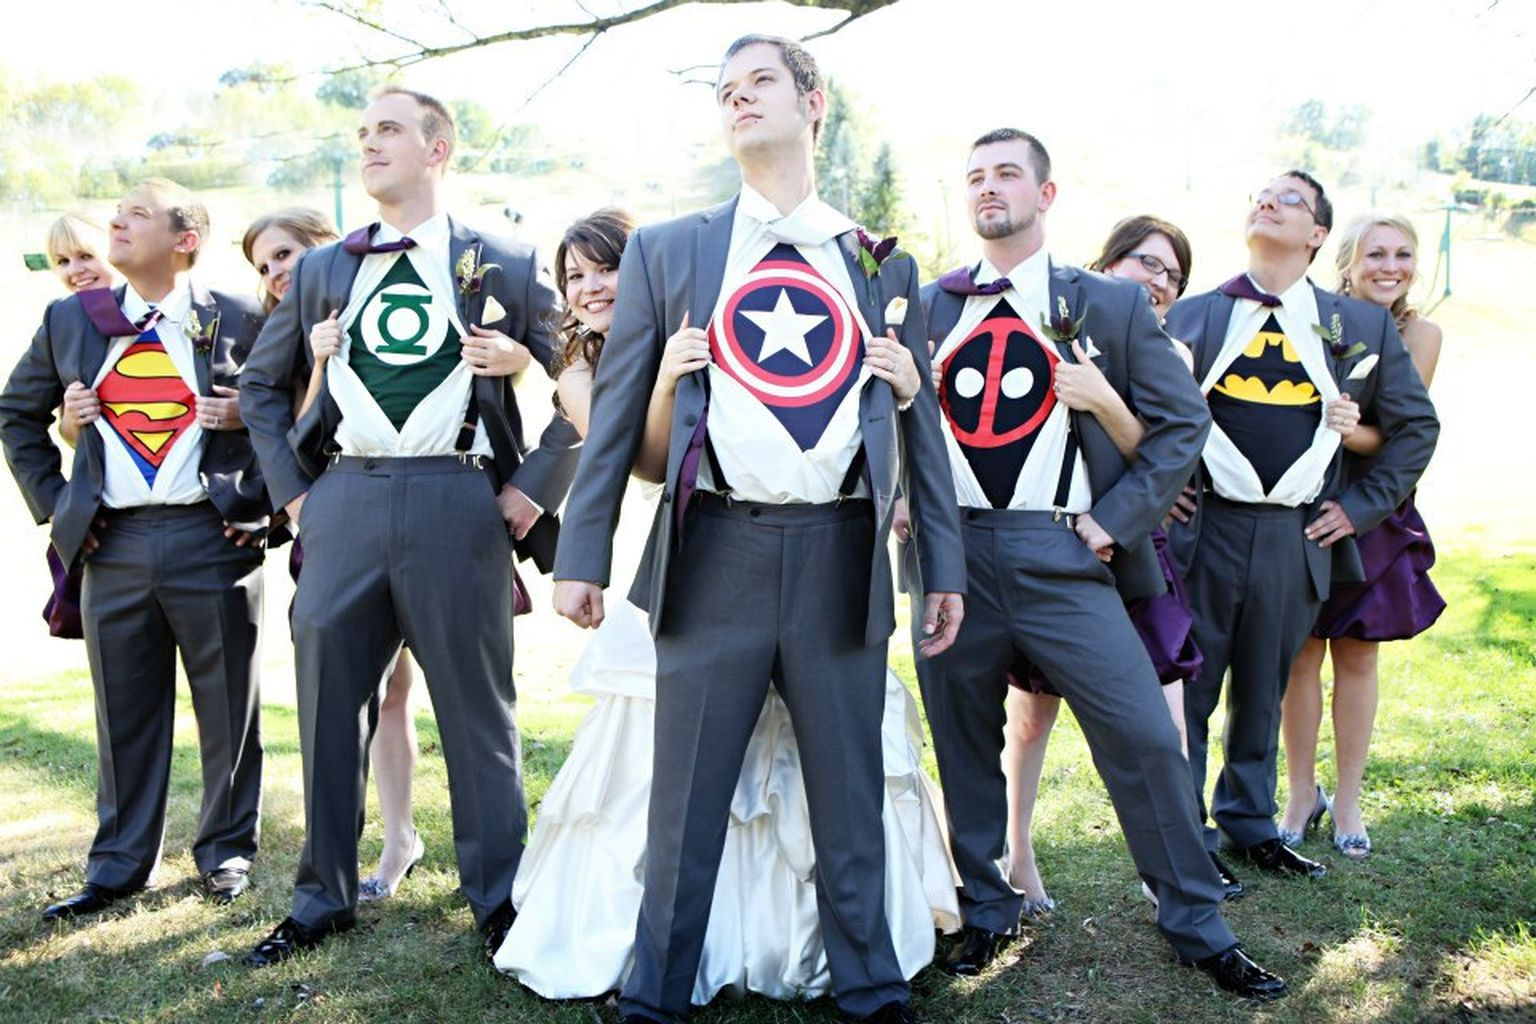 Matrimonio Tema Marvel : Cute groomsmen superhero shirts ideas for unforgettable